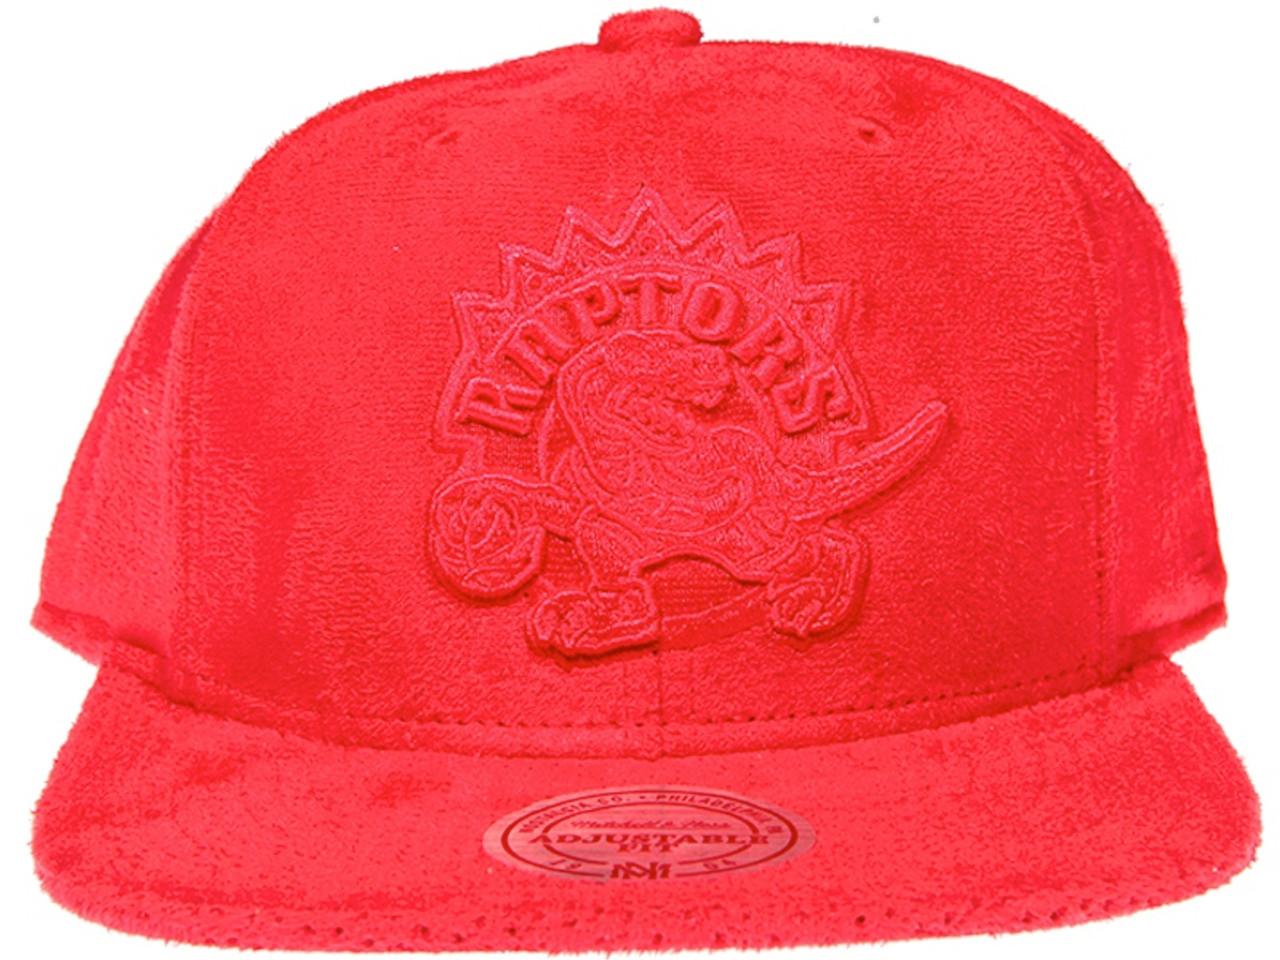 85d15dab1804f ... reduced toronto raptors logo mitchell ness nba red suede snapback hat  0f6e8 a33cb